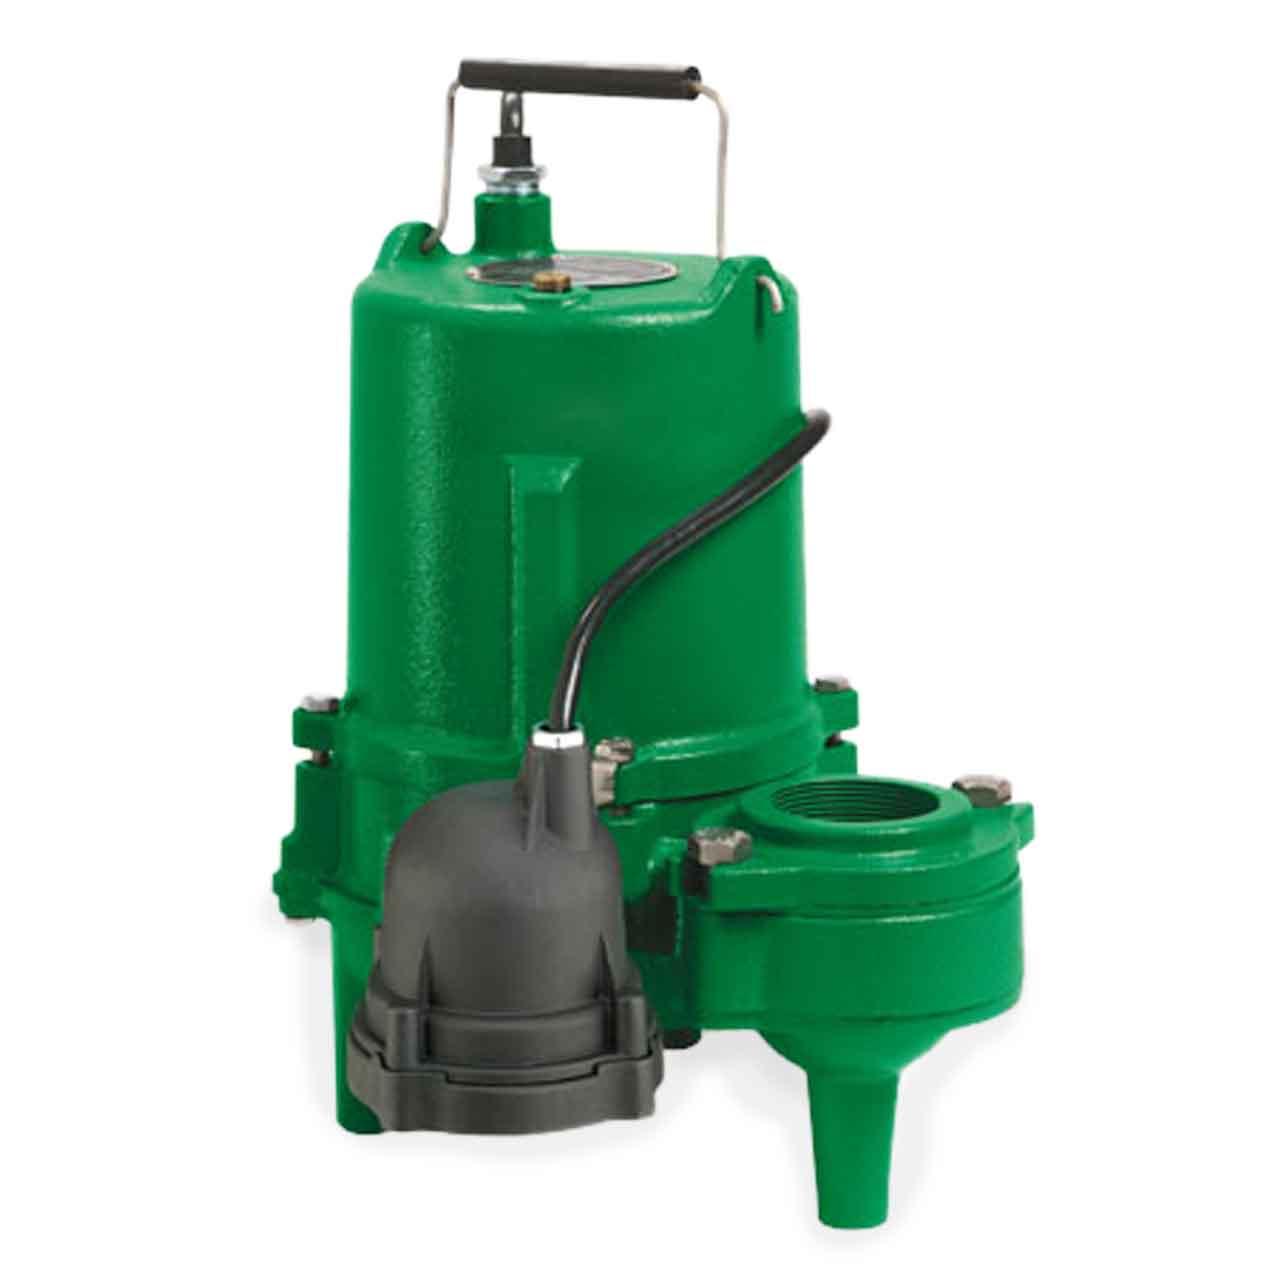 Myers MSP50M1 Submersible Sewage Pump 05 HP 115V 1PH Manual 20 Cord Myers